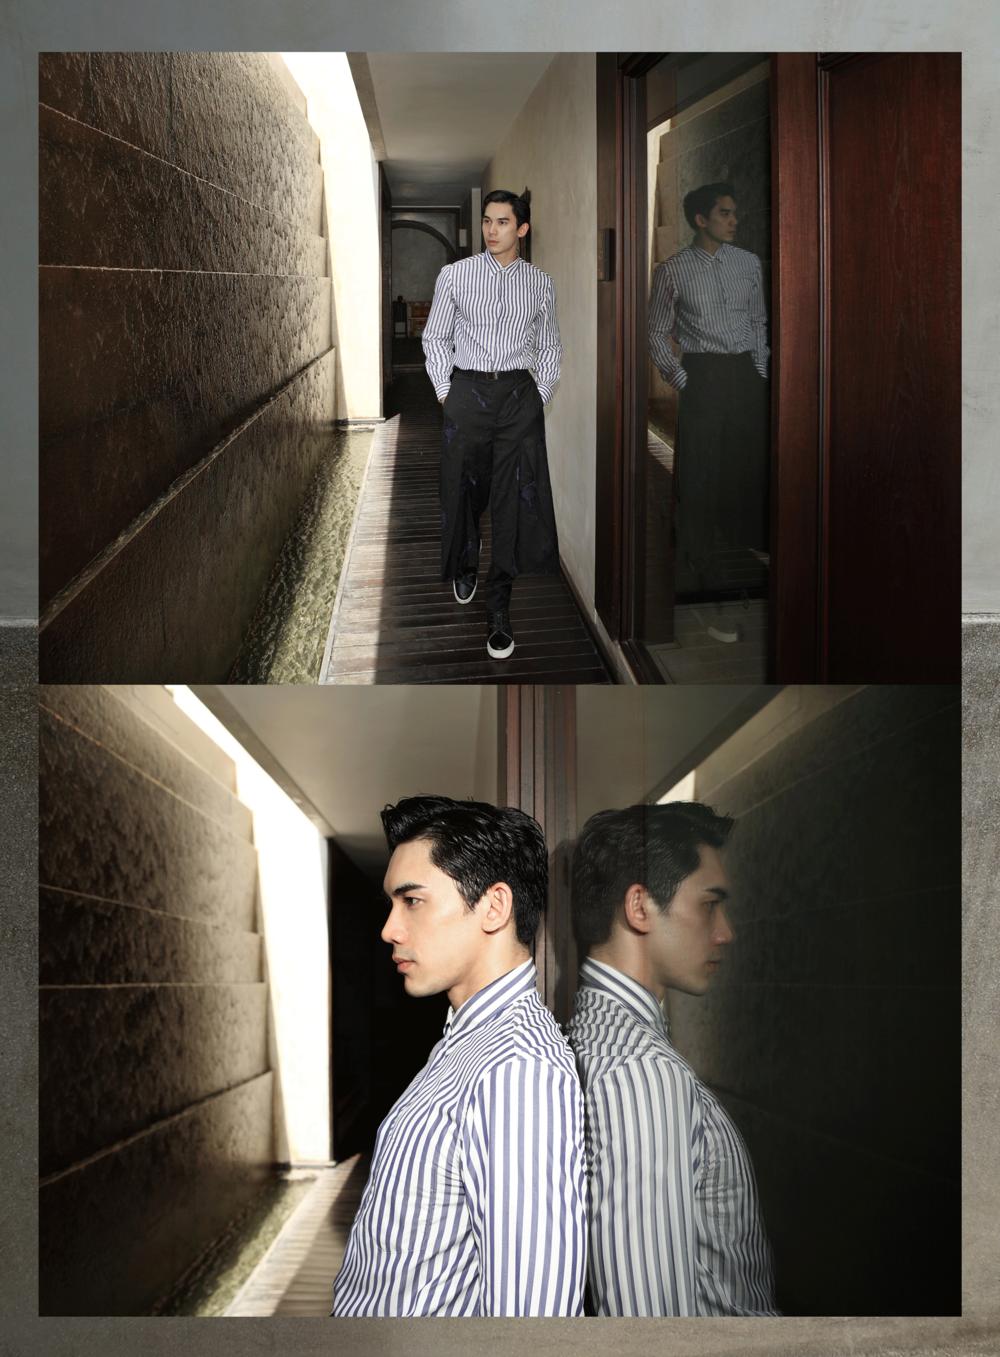 clothes : Emporio Armani / shoes : Christian Louboutin